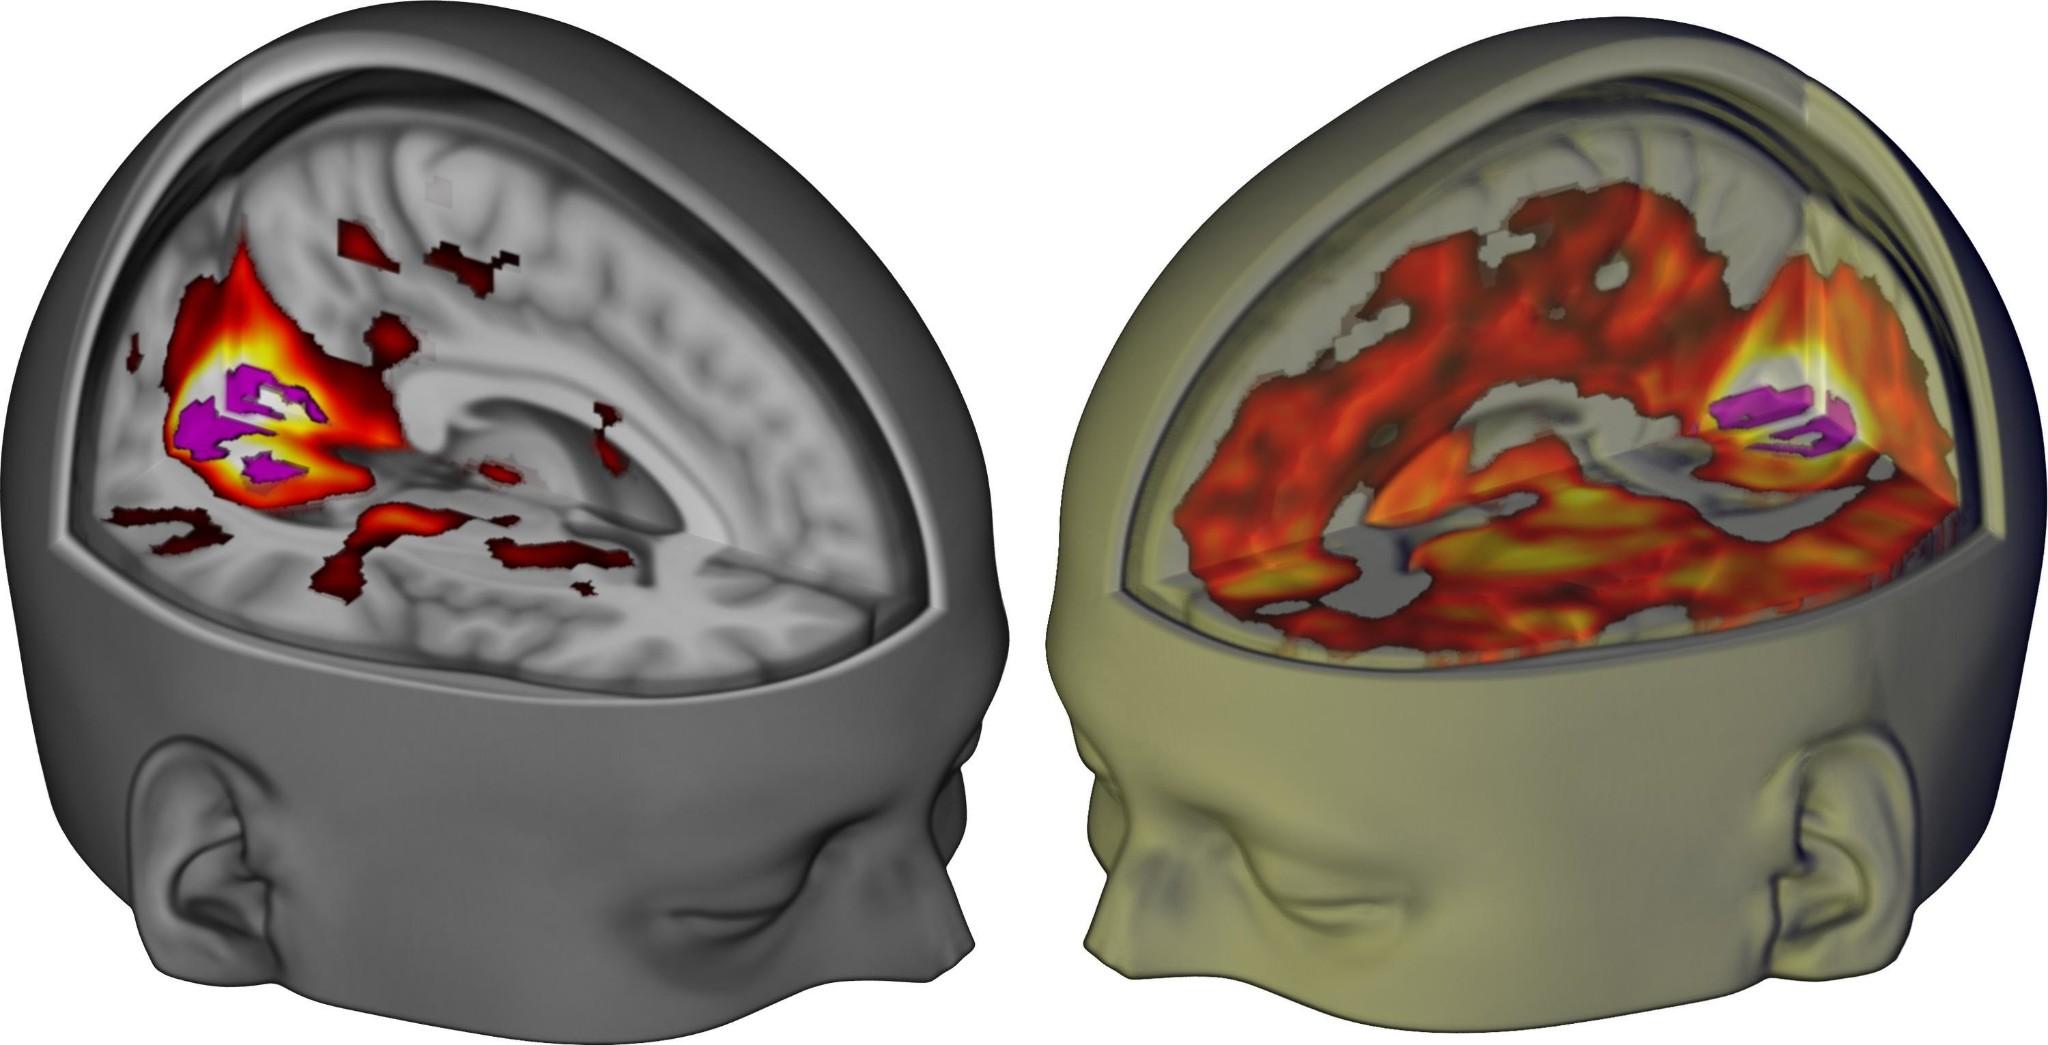 LSD's impact on the brain revealed in groundbreaking images